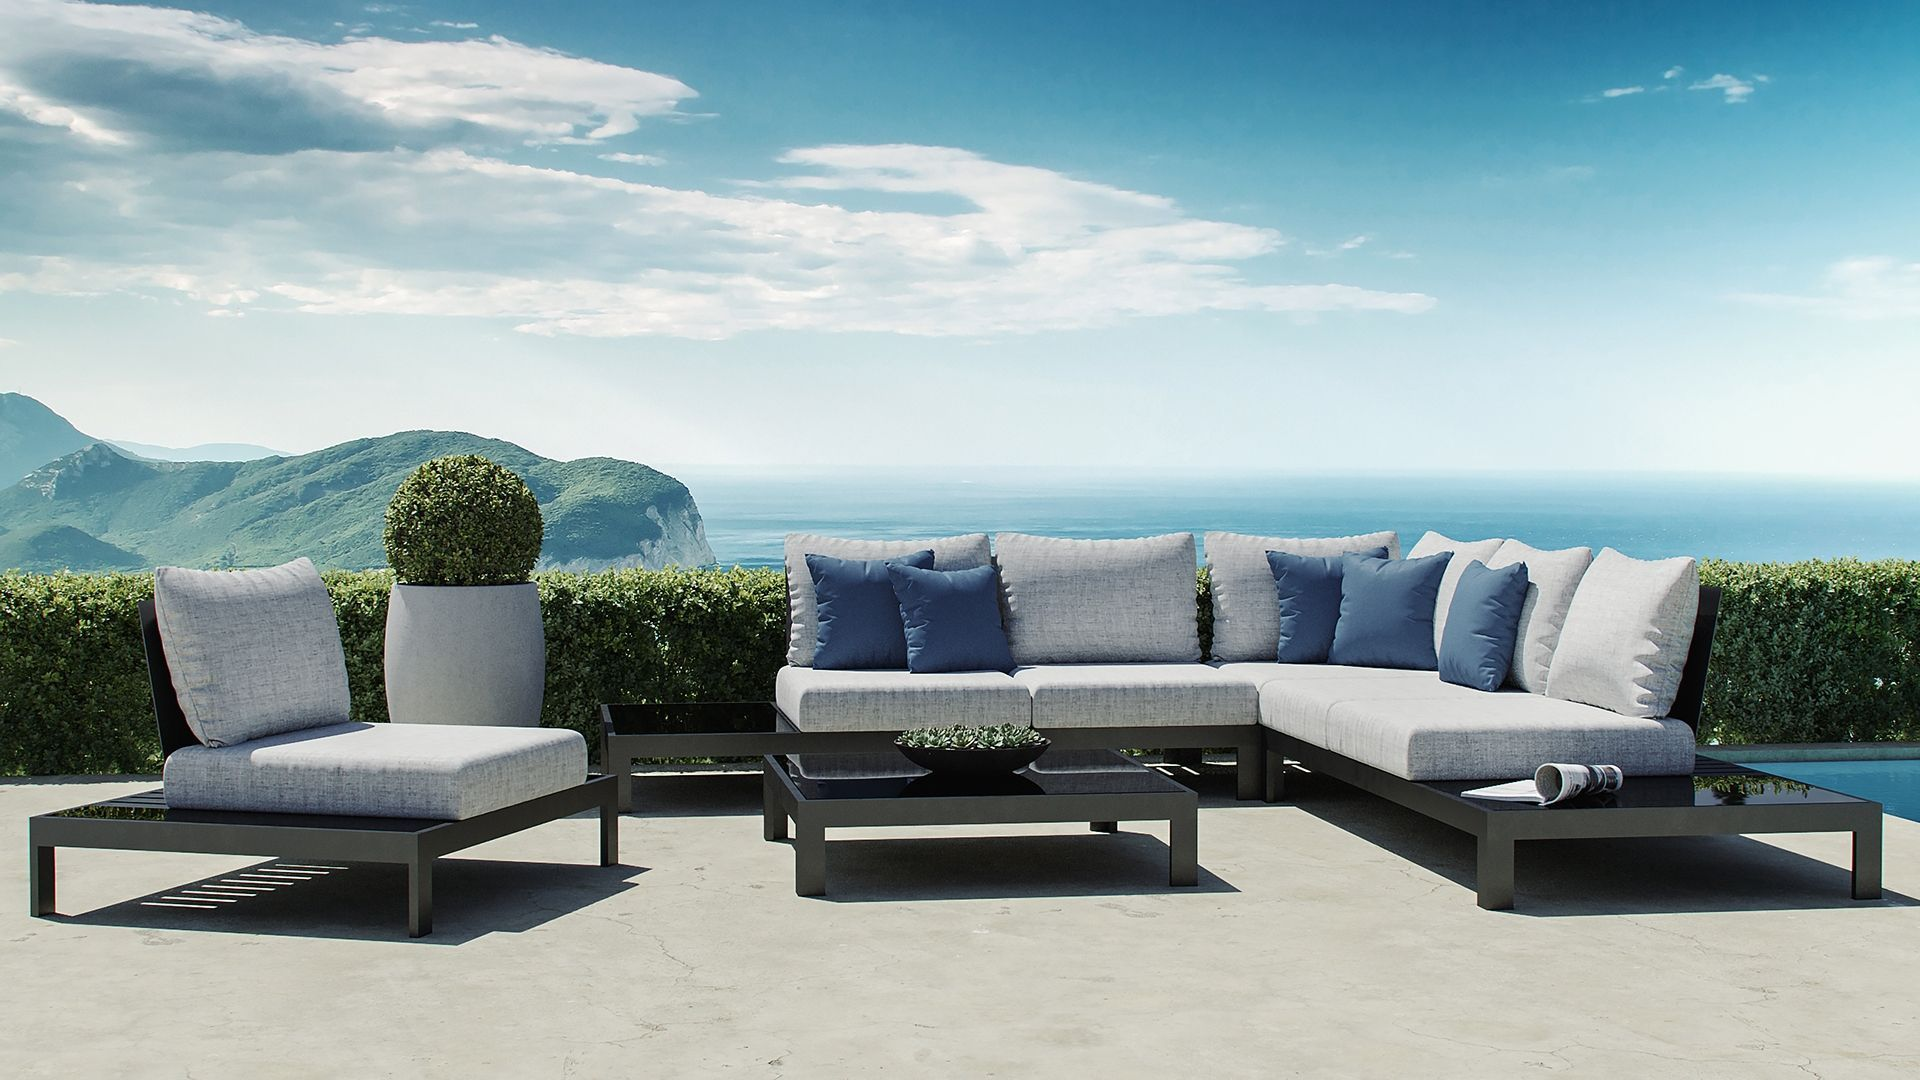 Valentino L Outdoor Lounge Mobel Lounge Mobel Moderne Lounge